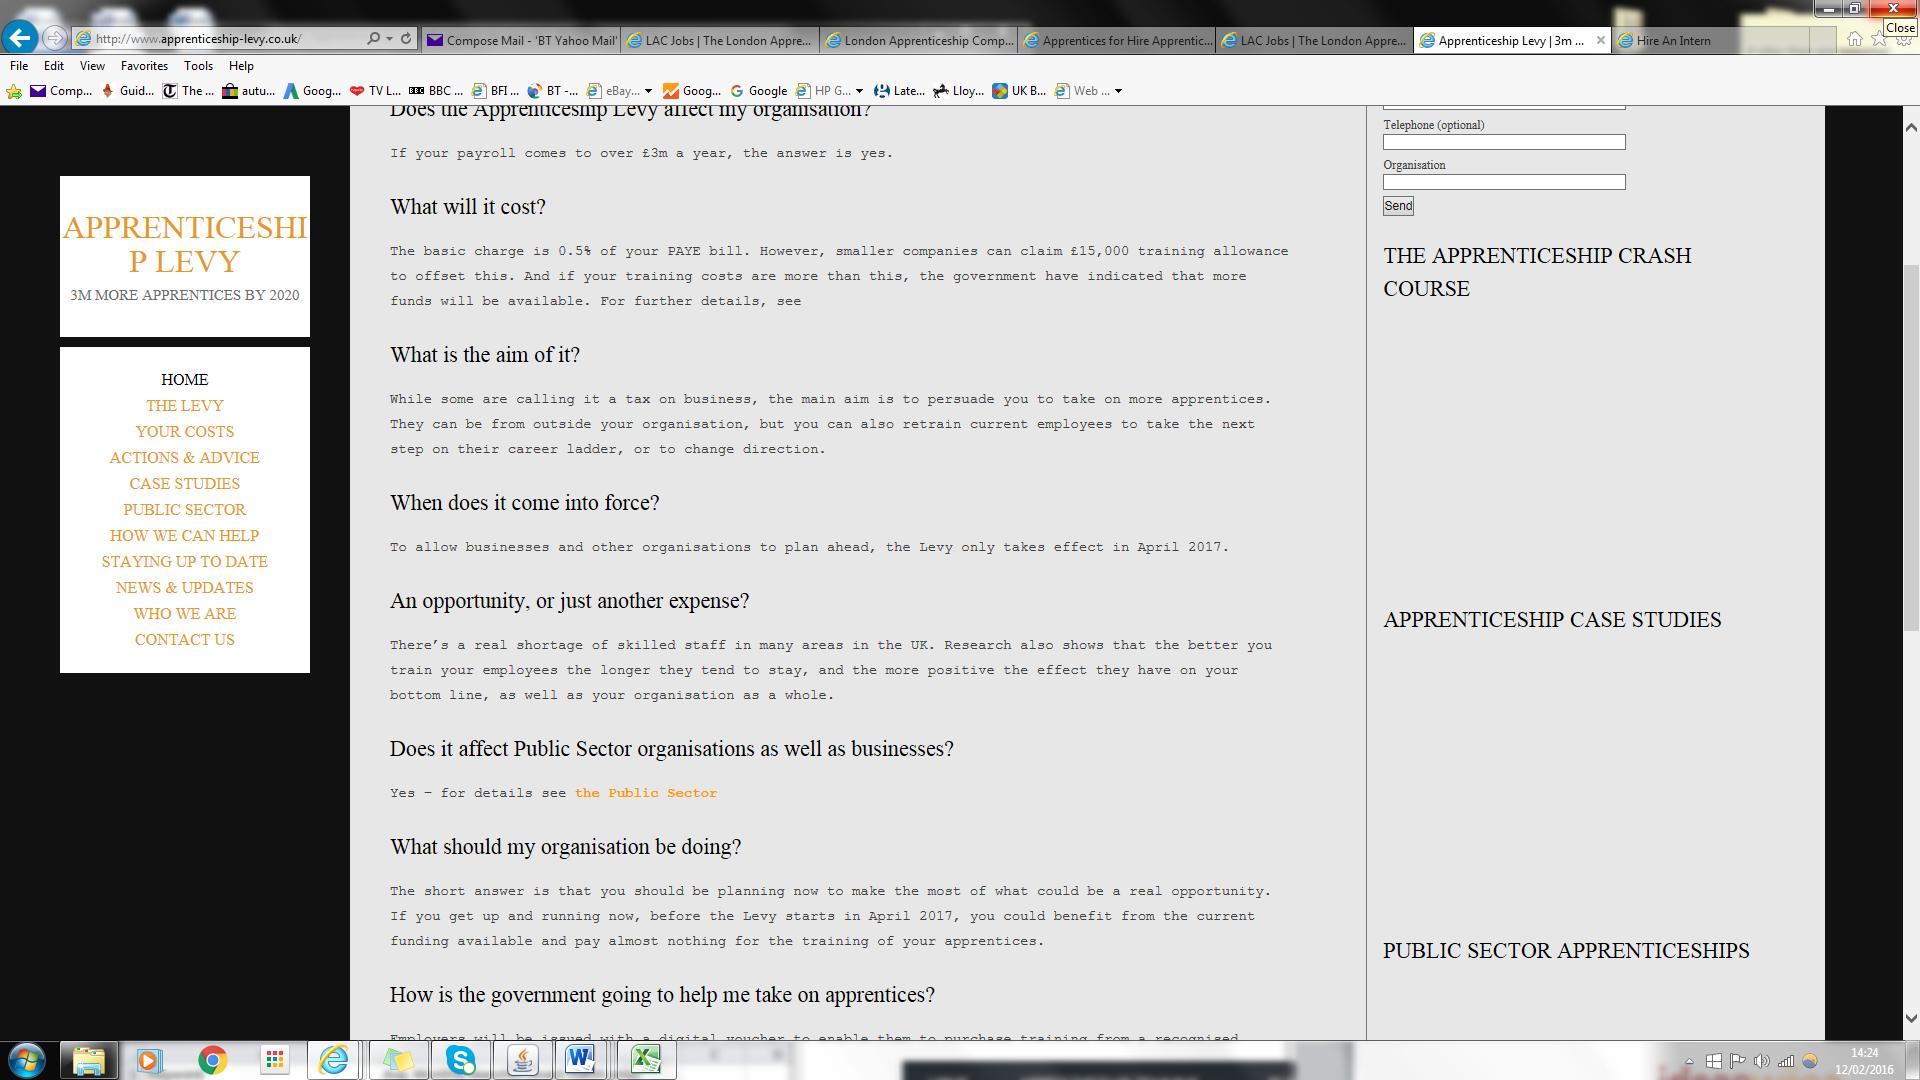 Apprenticeship Levy website